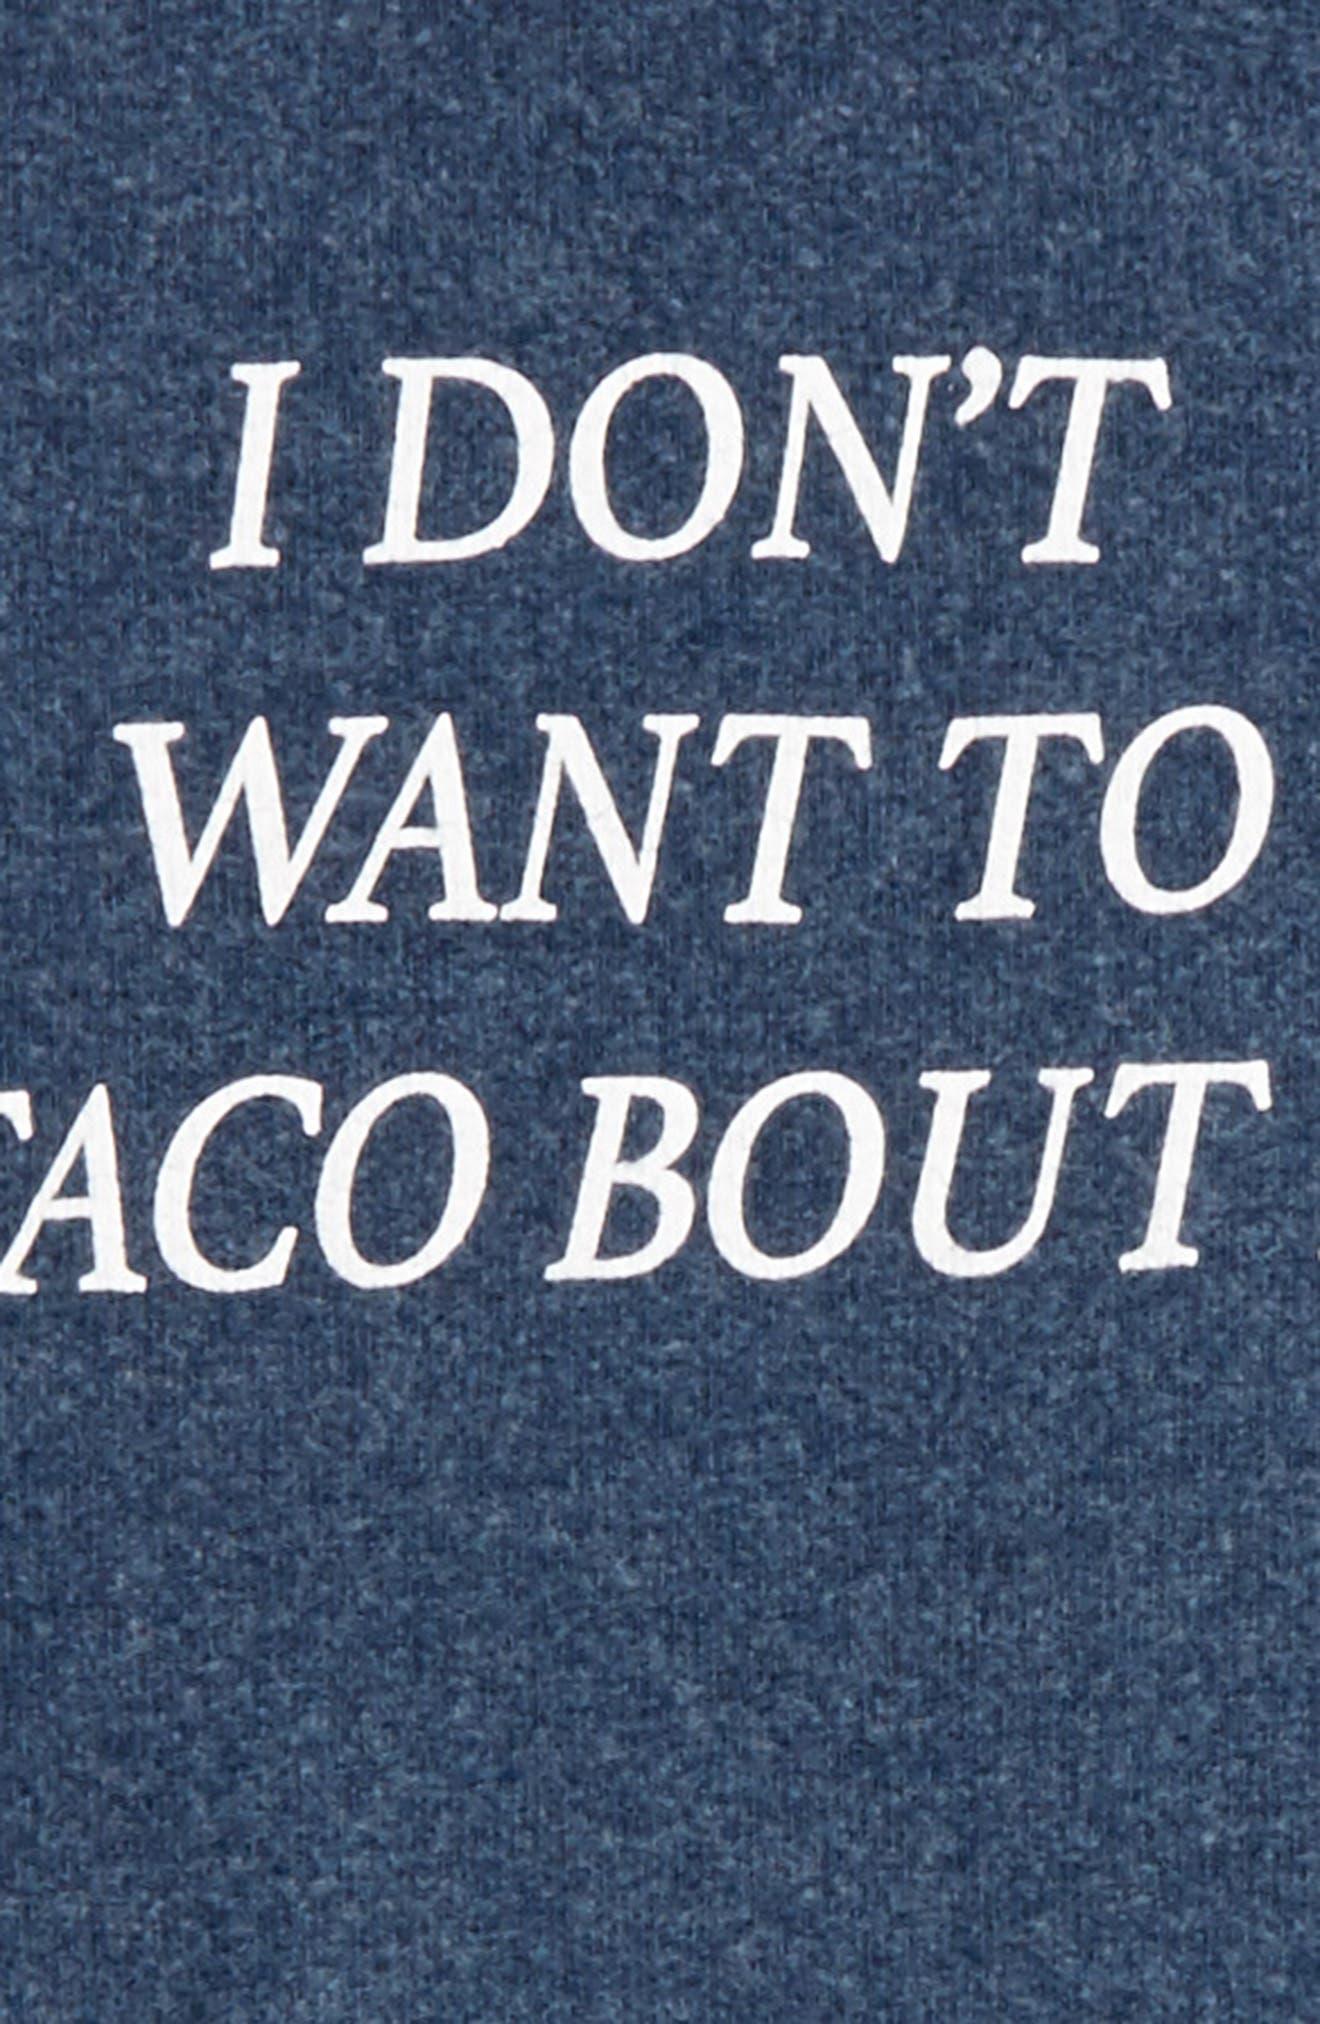 Baggy Beach Jumper - Taco Talk Pullover,                             Alternate thumbnail 2, color,                             Galaxy Blue